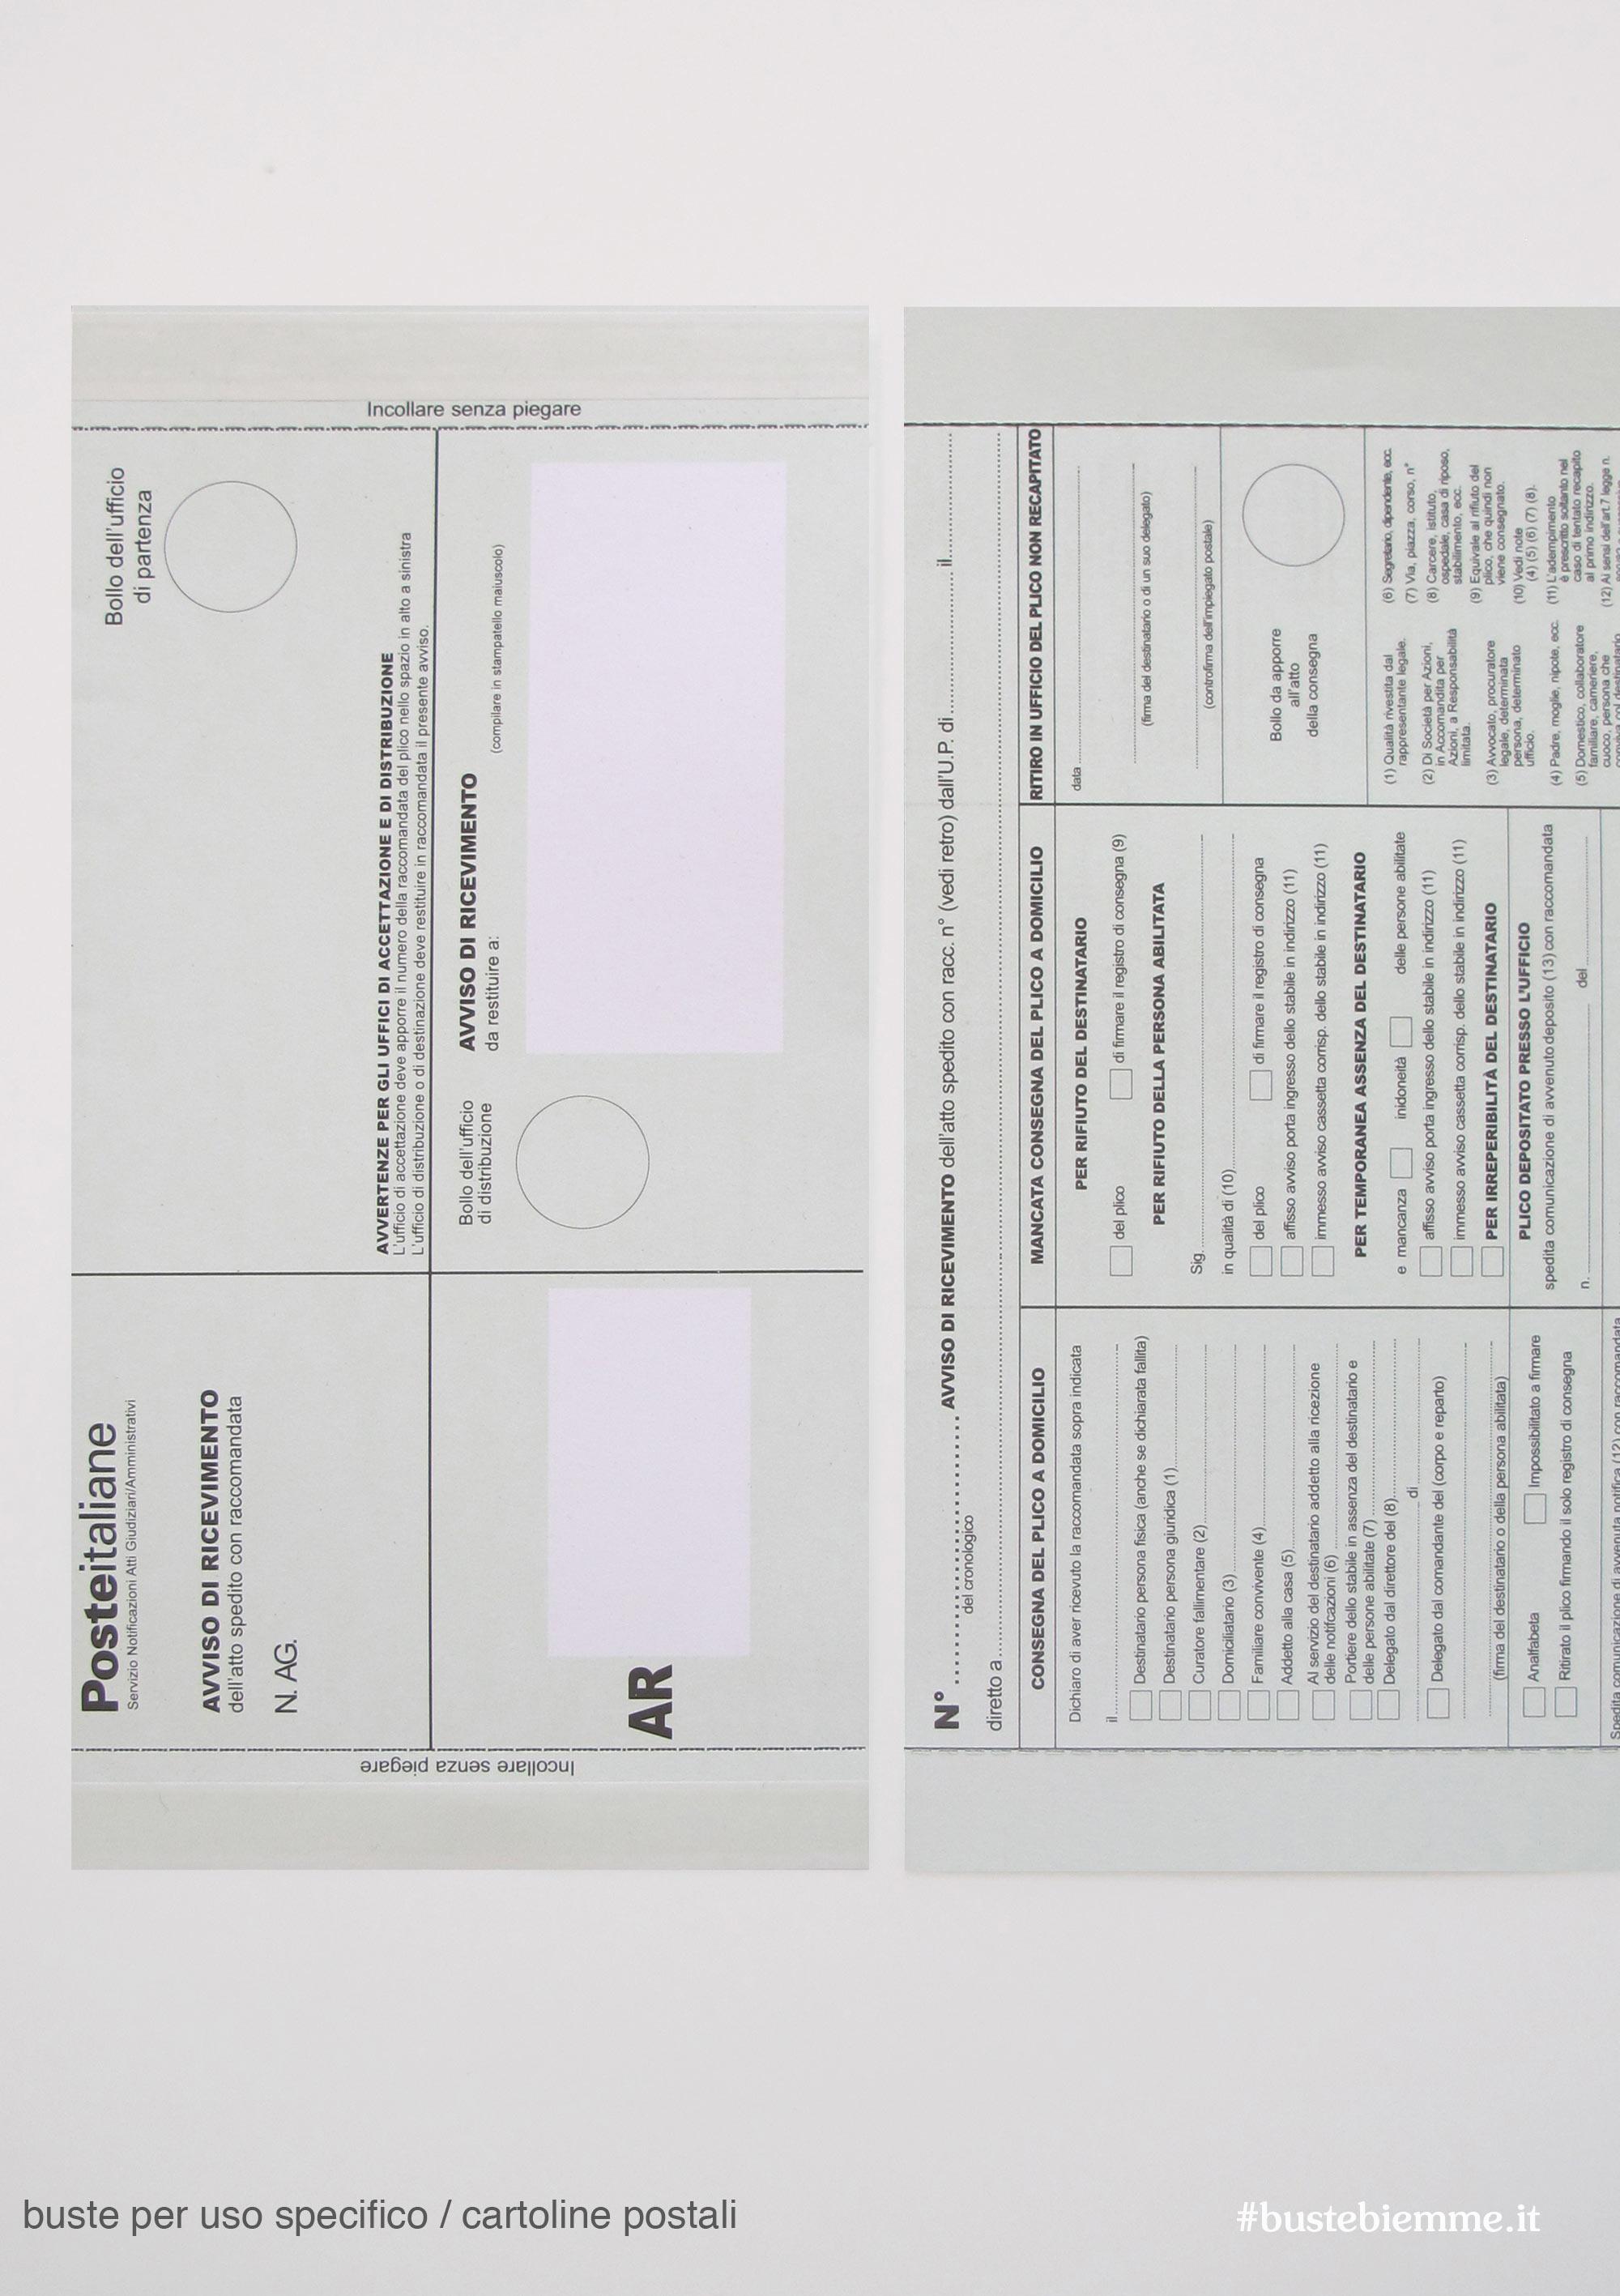 cartoline postali avviso di ricevimento